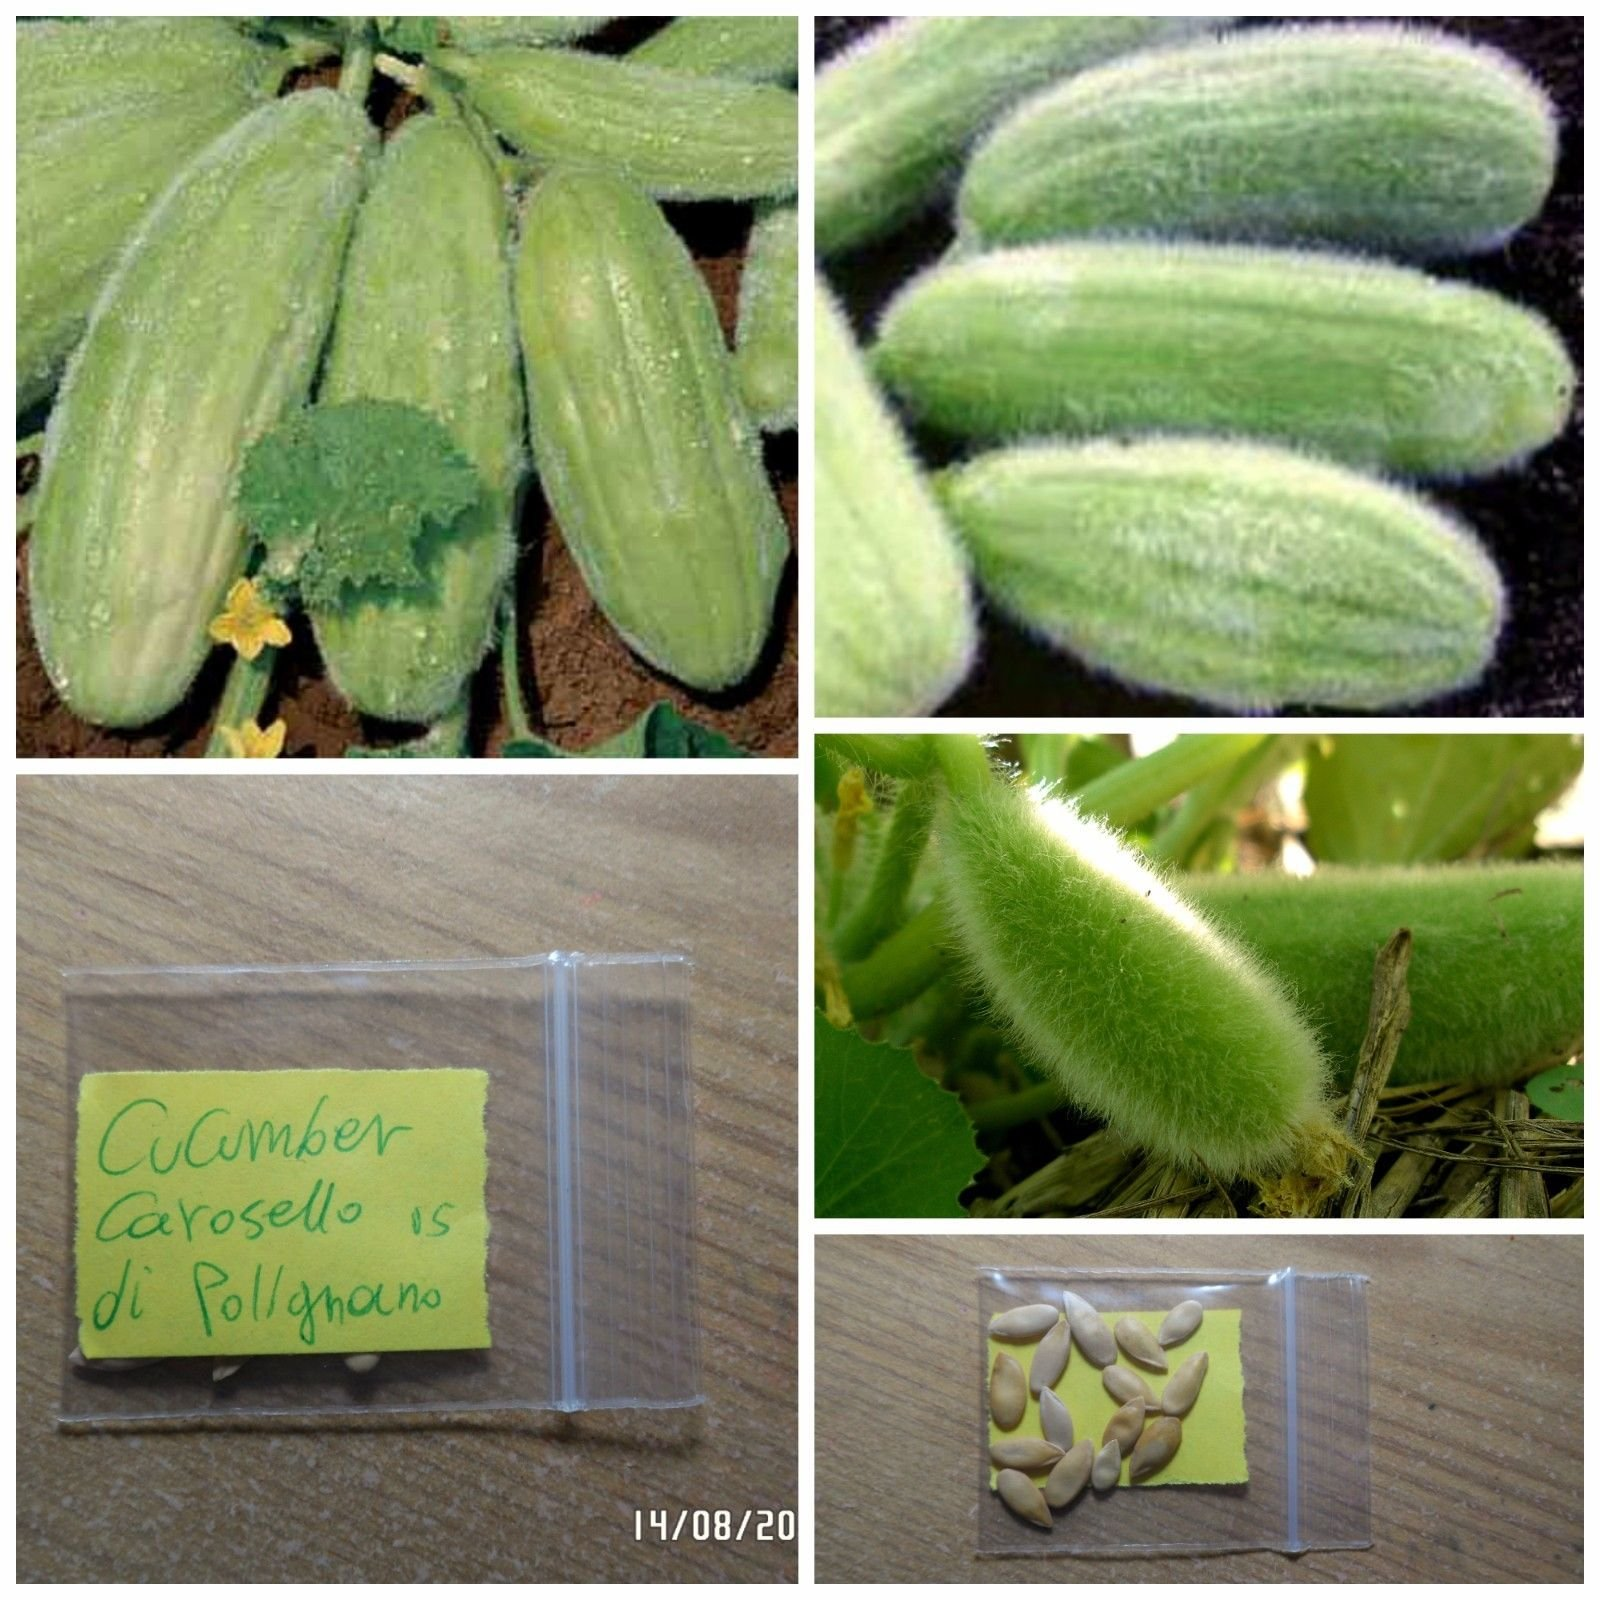 Rare Italian Cucumber ''Carosello di Polignano'' ~15 Top Quality Seeds - Organic by sivri-gr2013